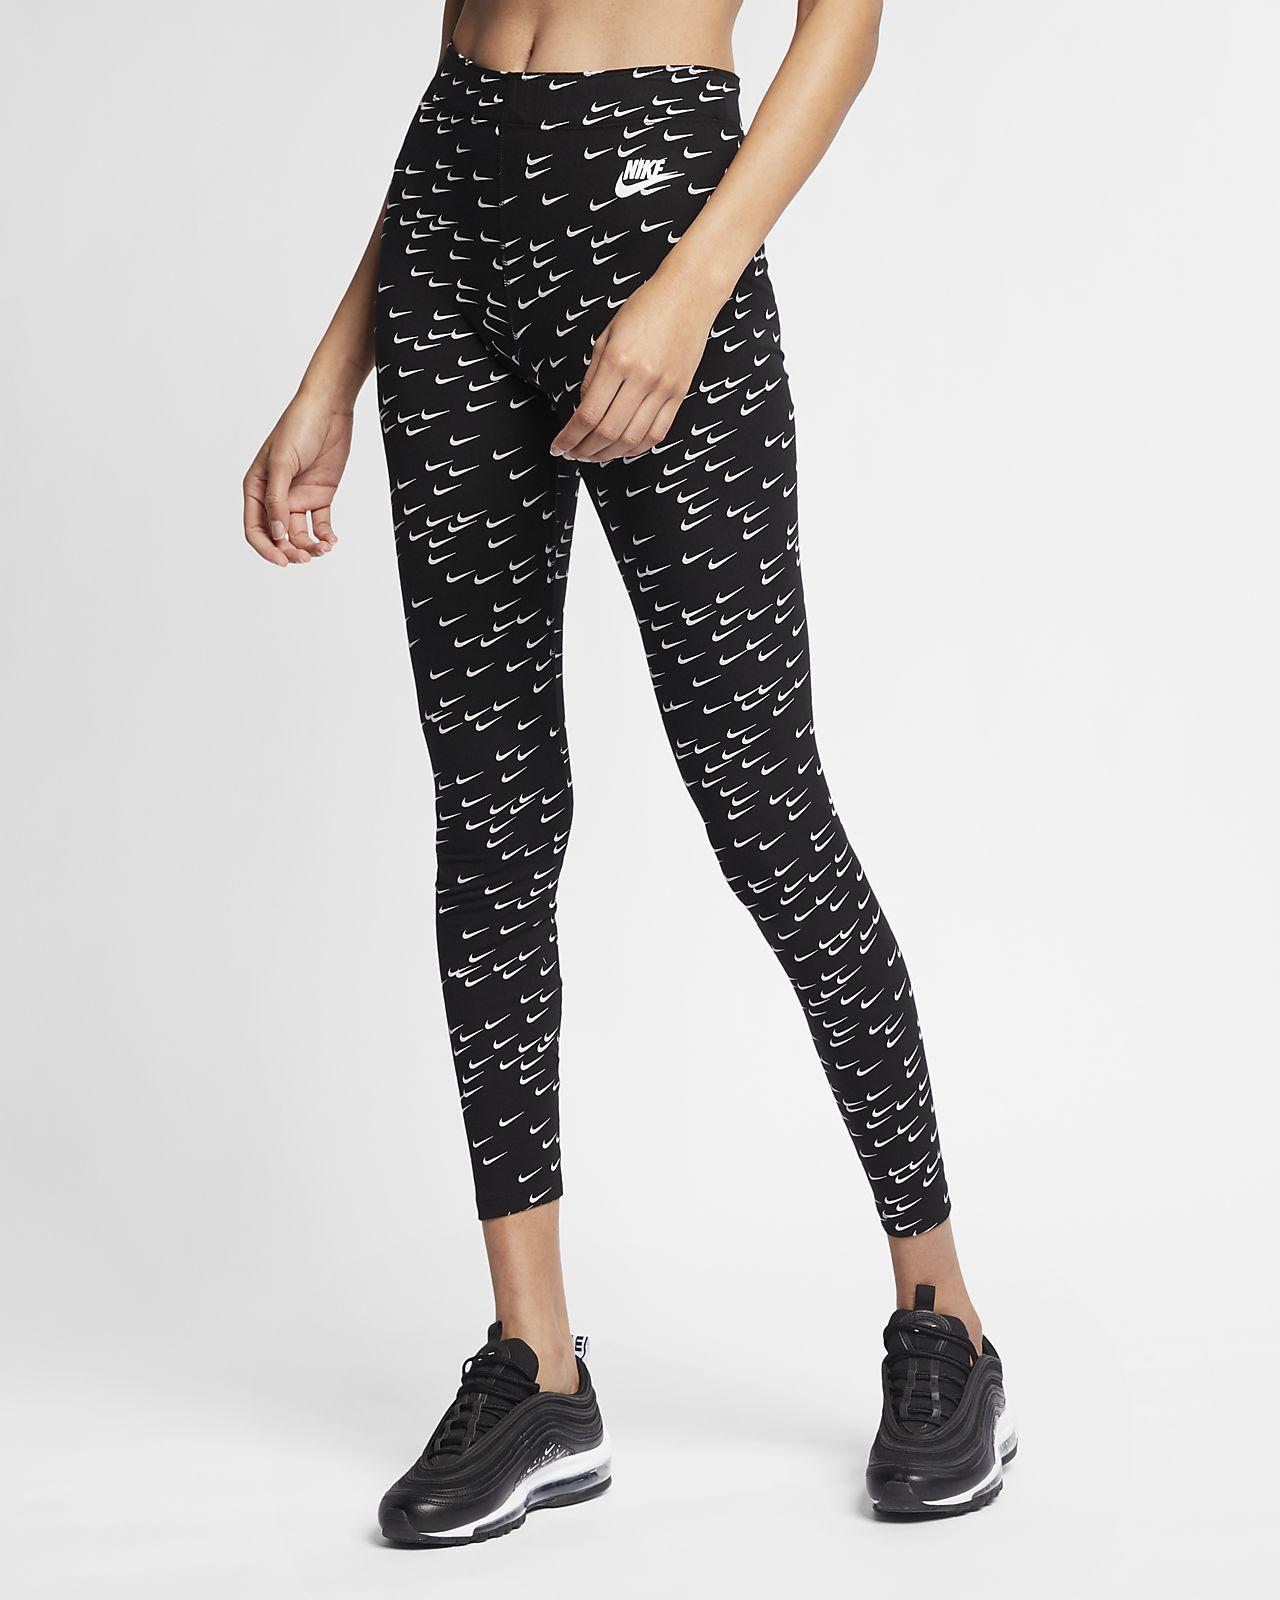 Nike Sportswear Leg-A-See Swoosh Women's Printed Leggings